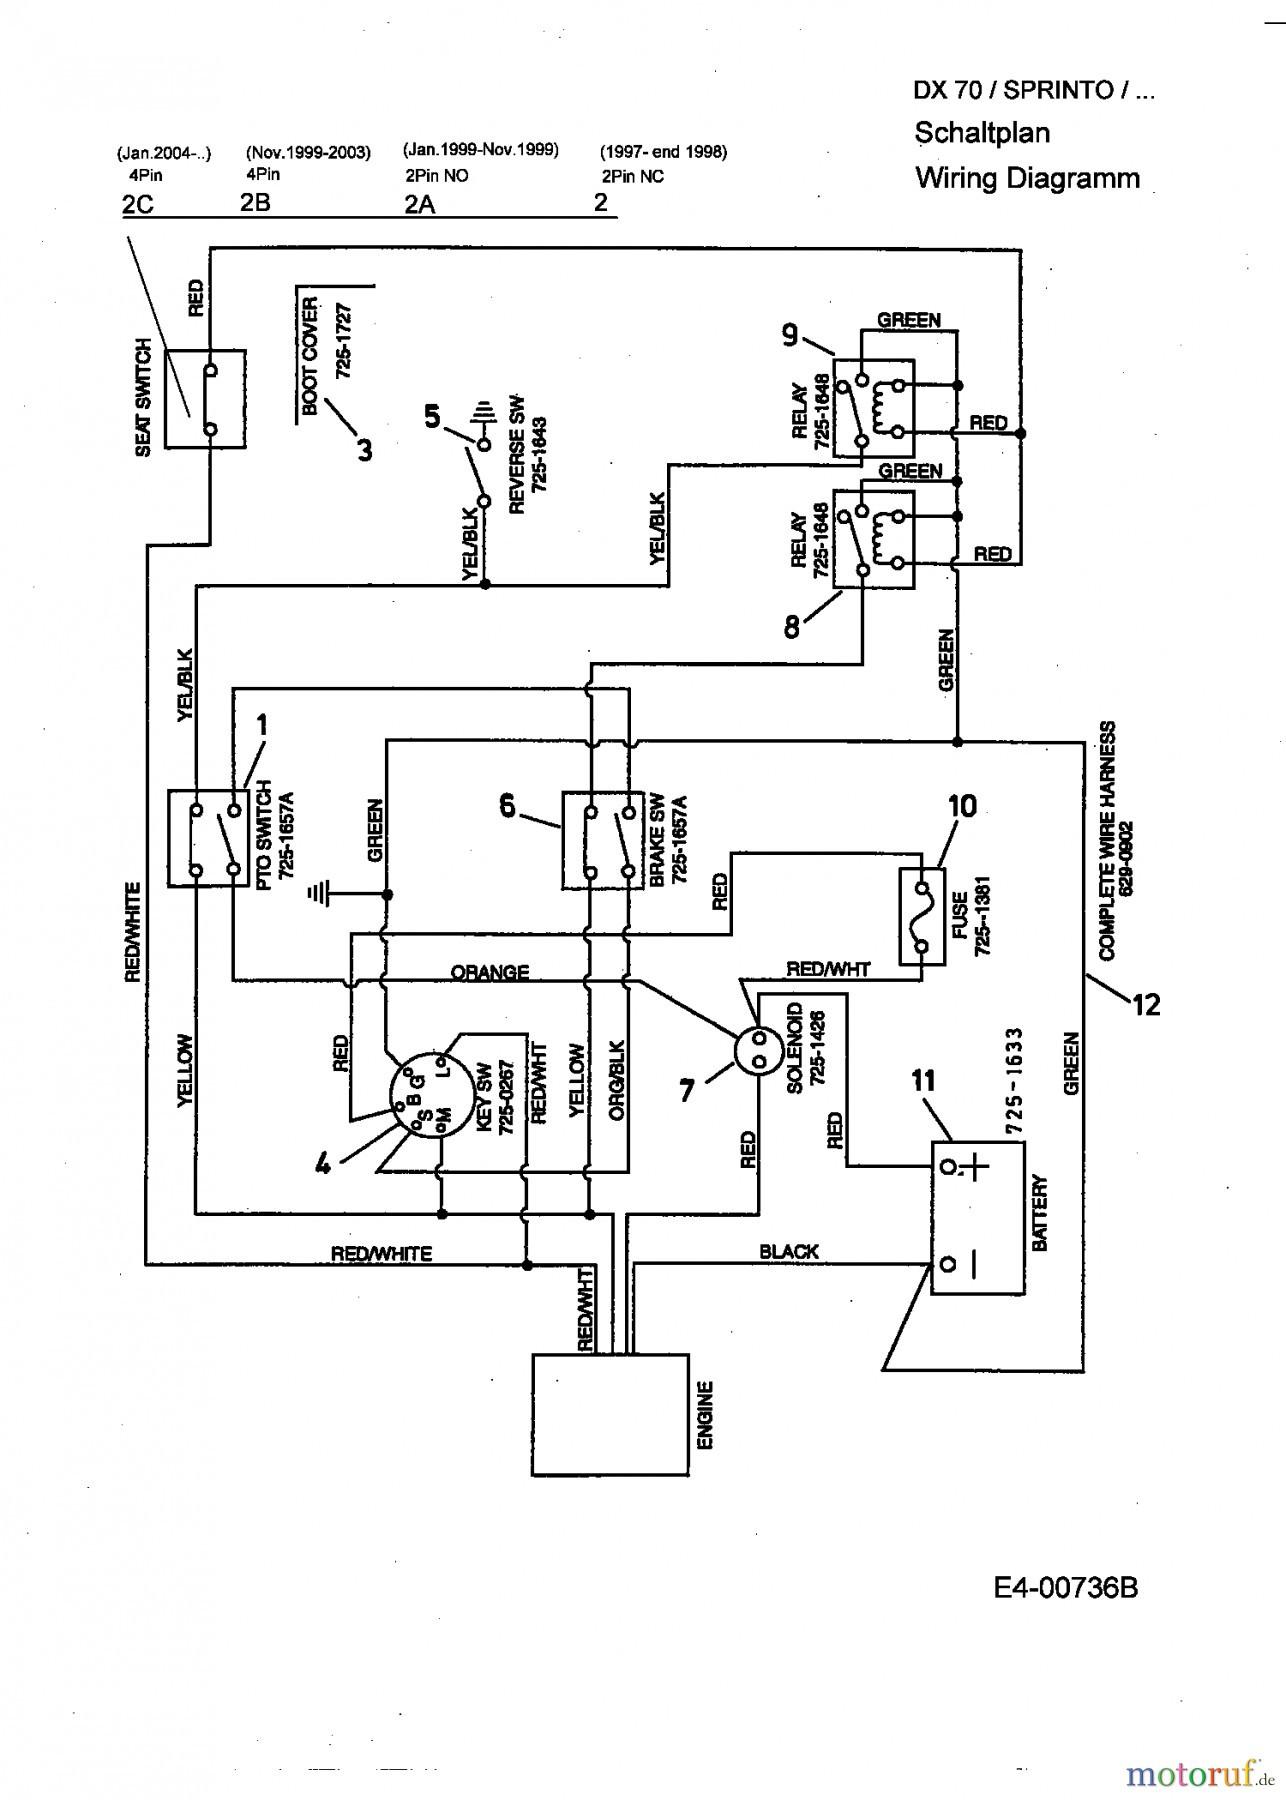 2004 arctic cat 250 wiring diagram schematic mtd 2150 wiring diagram wiring diagram data  mtd 2150 wiring diagram wiring